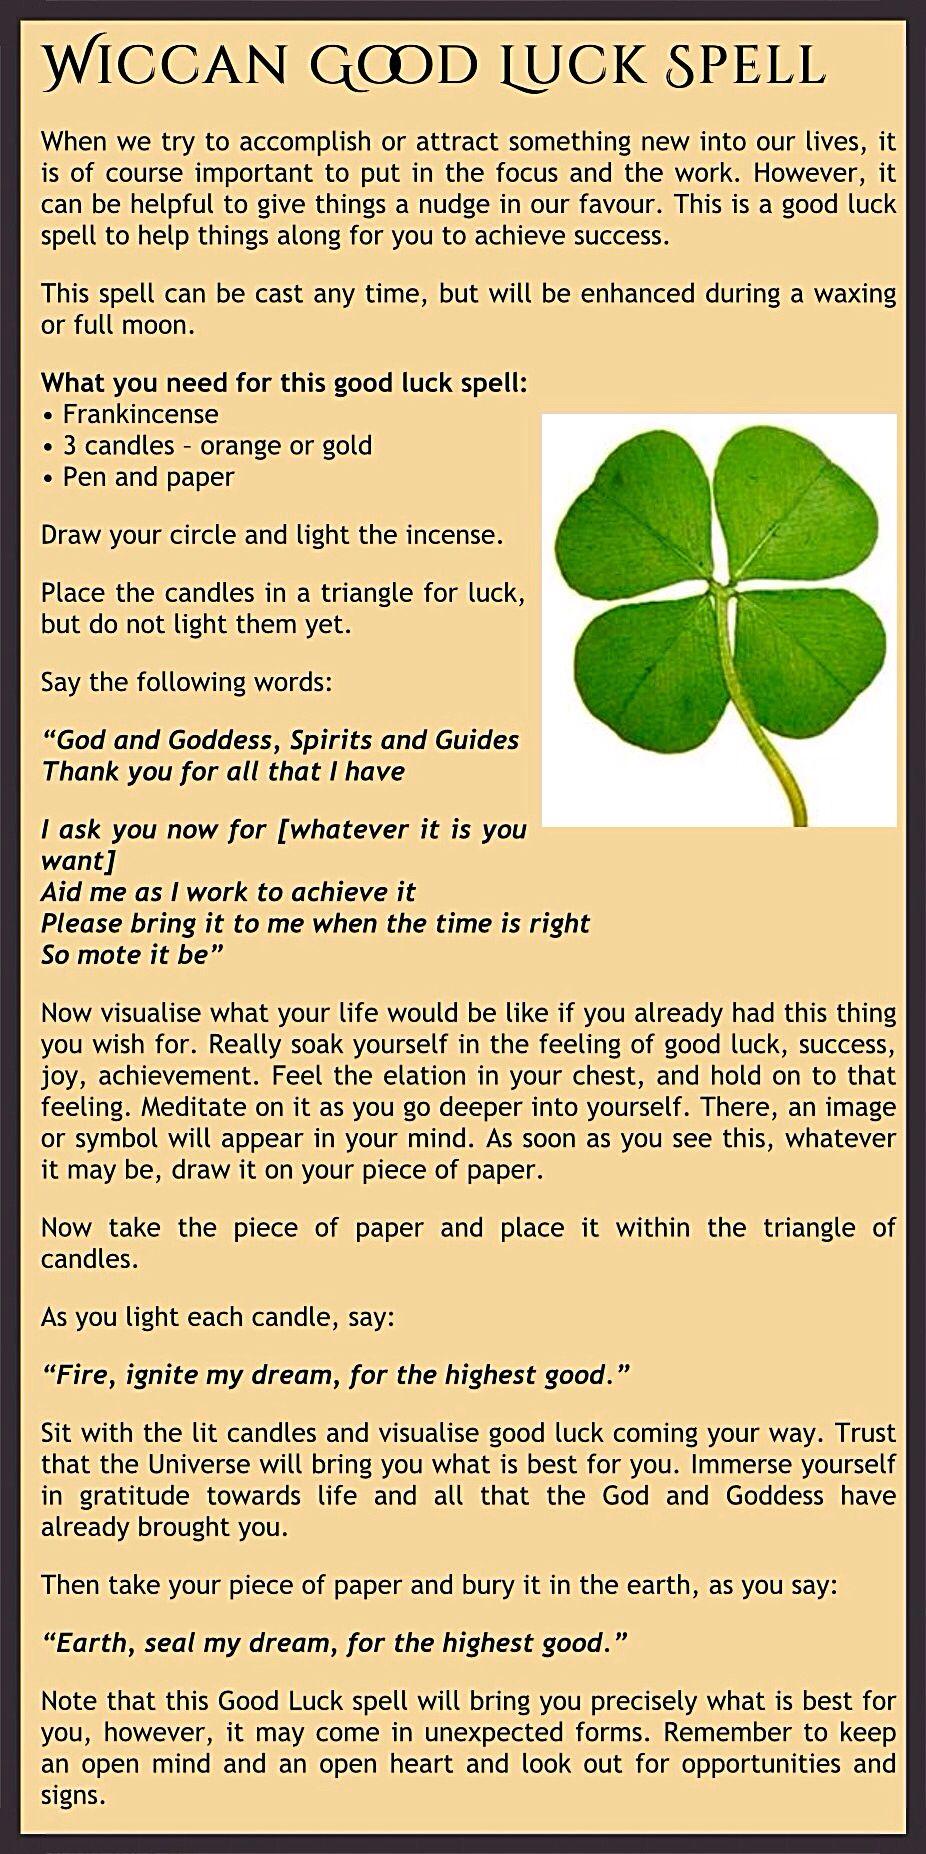 Good luck spell | Blessed  | Luck spells, Good luck spells